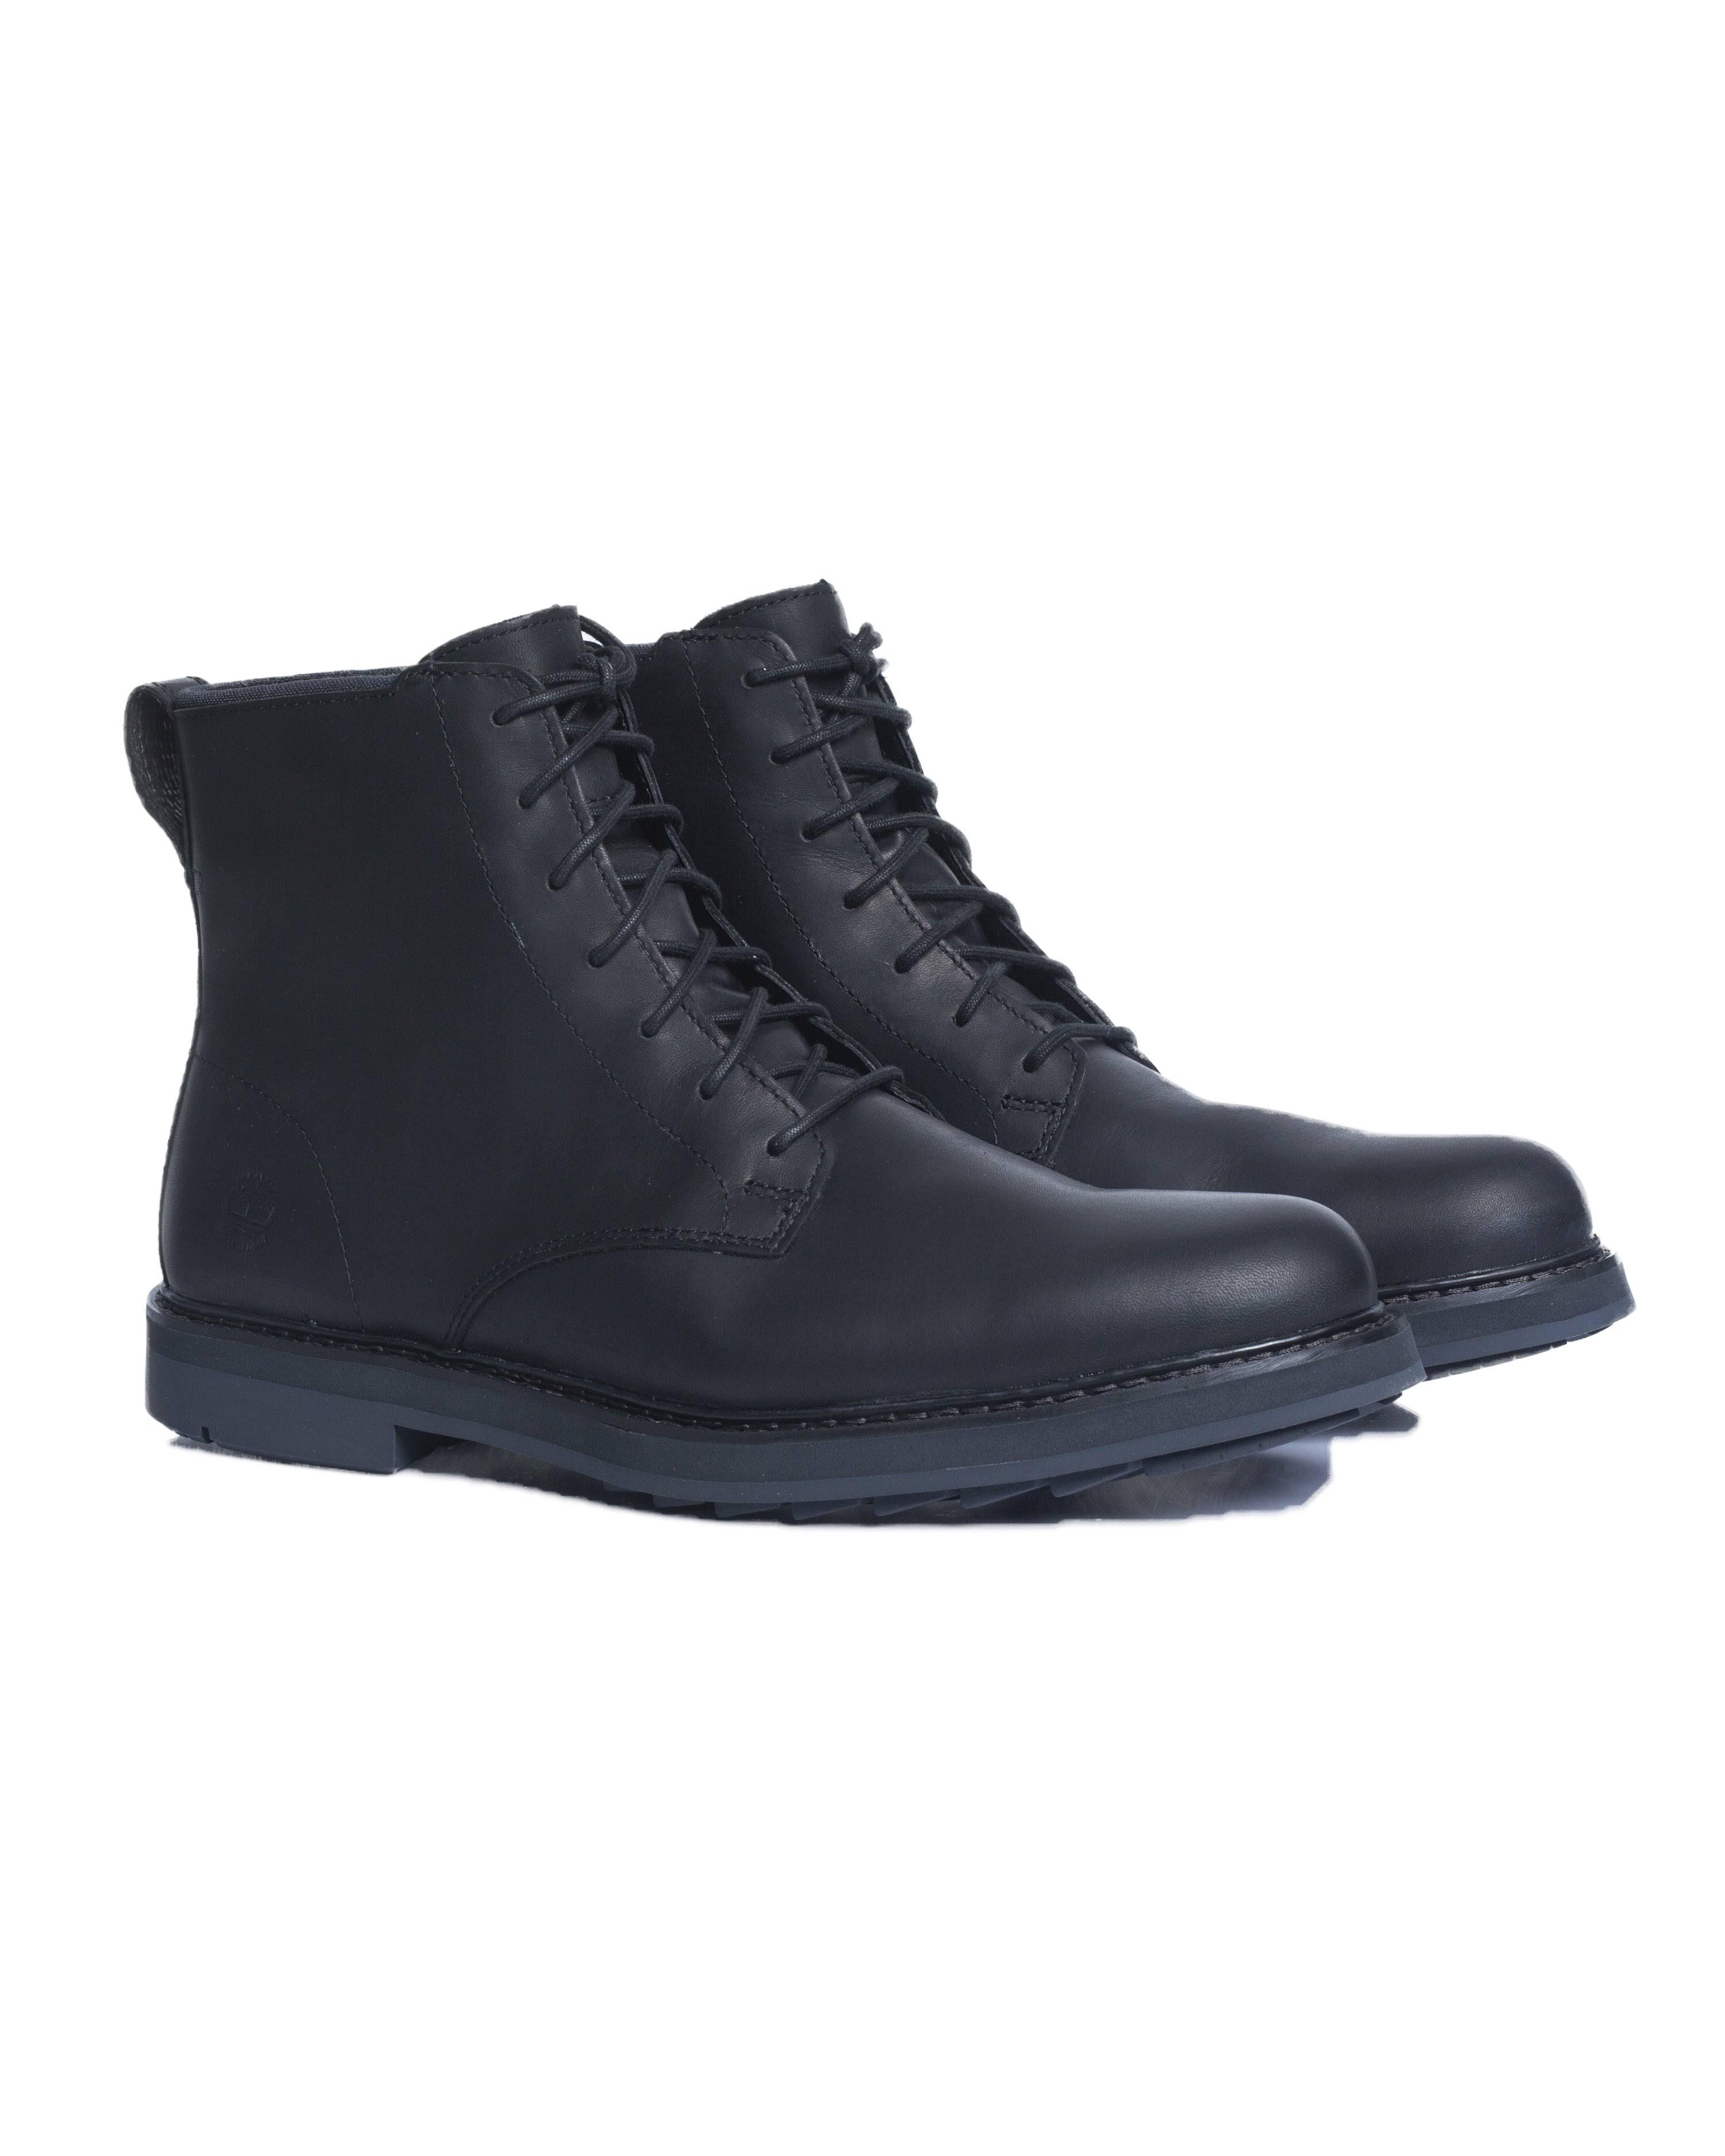 Timberland Squall Negro Canyon 12 Hombres Boot Tamaño D Black rrqxZwC